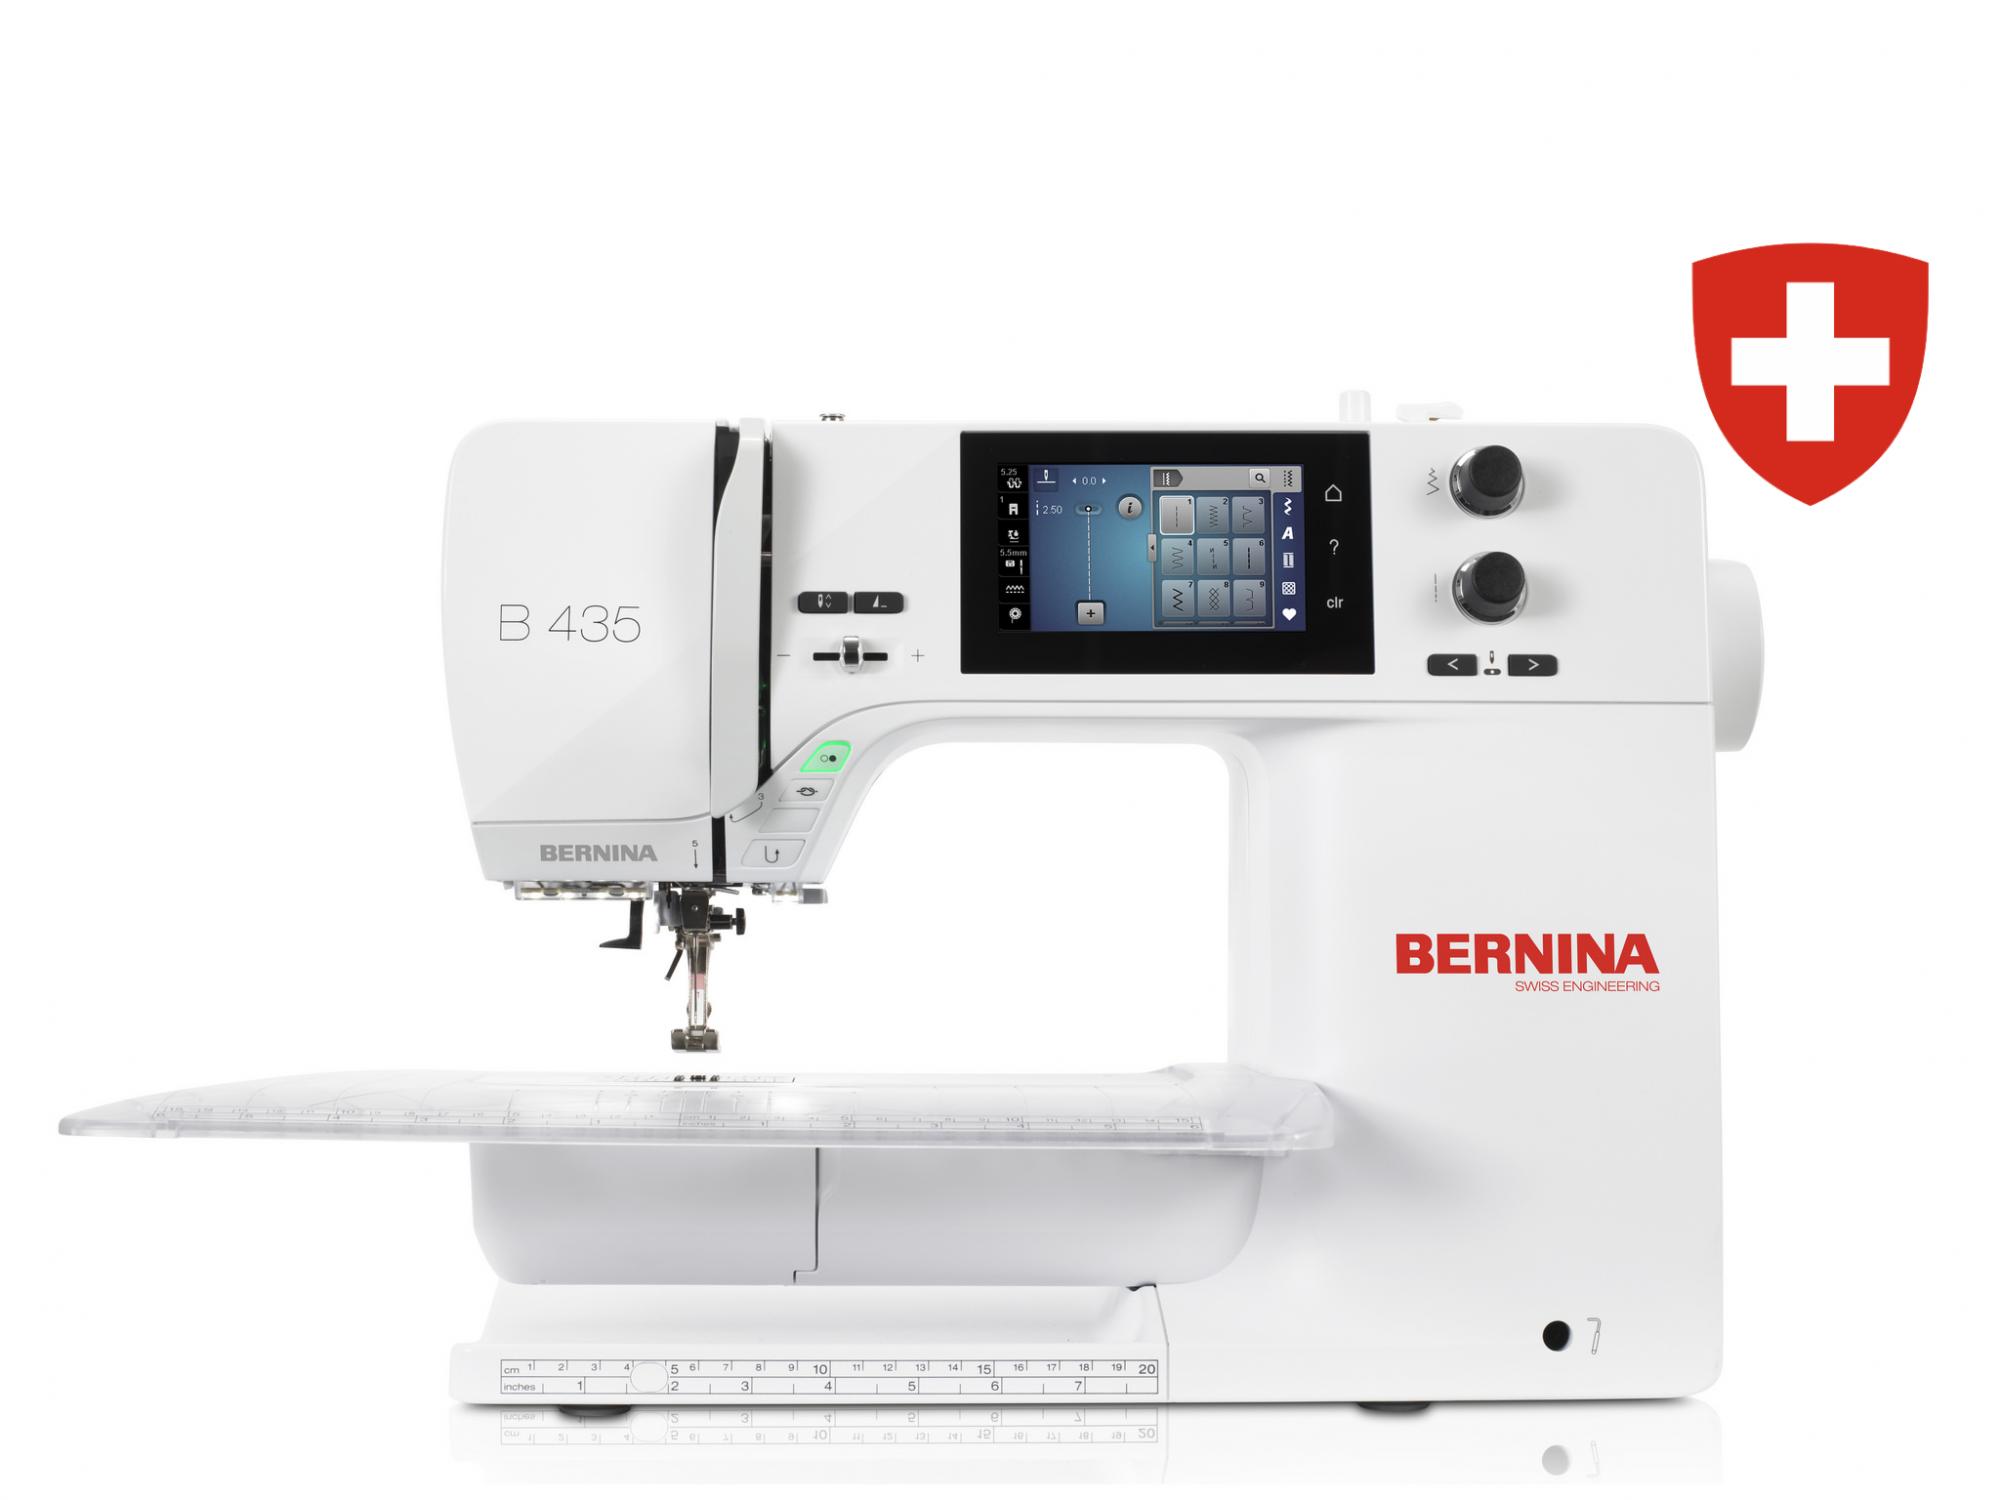 Kompiuterizuota siuvimo mašina BERNINA 435